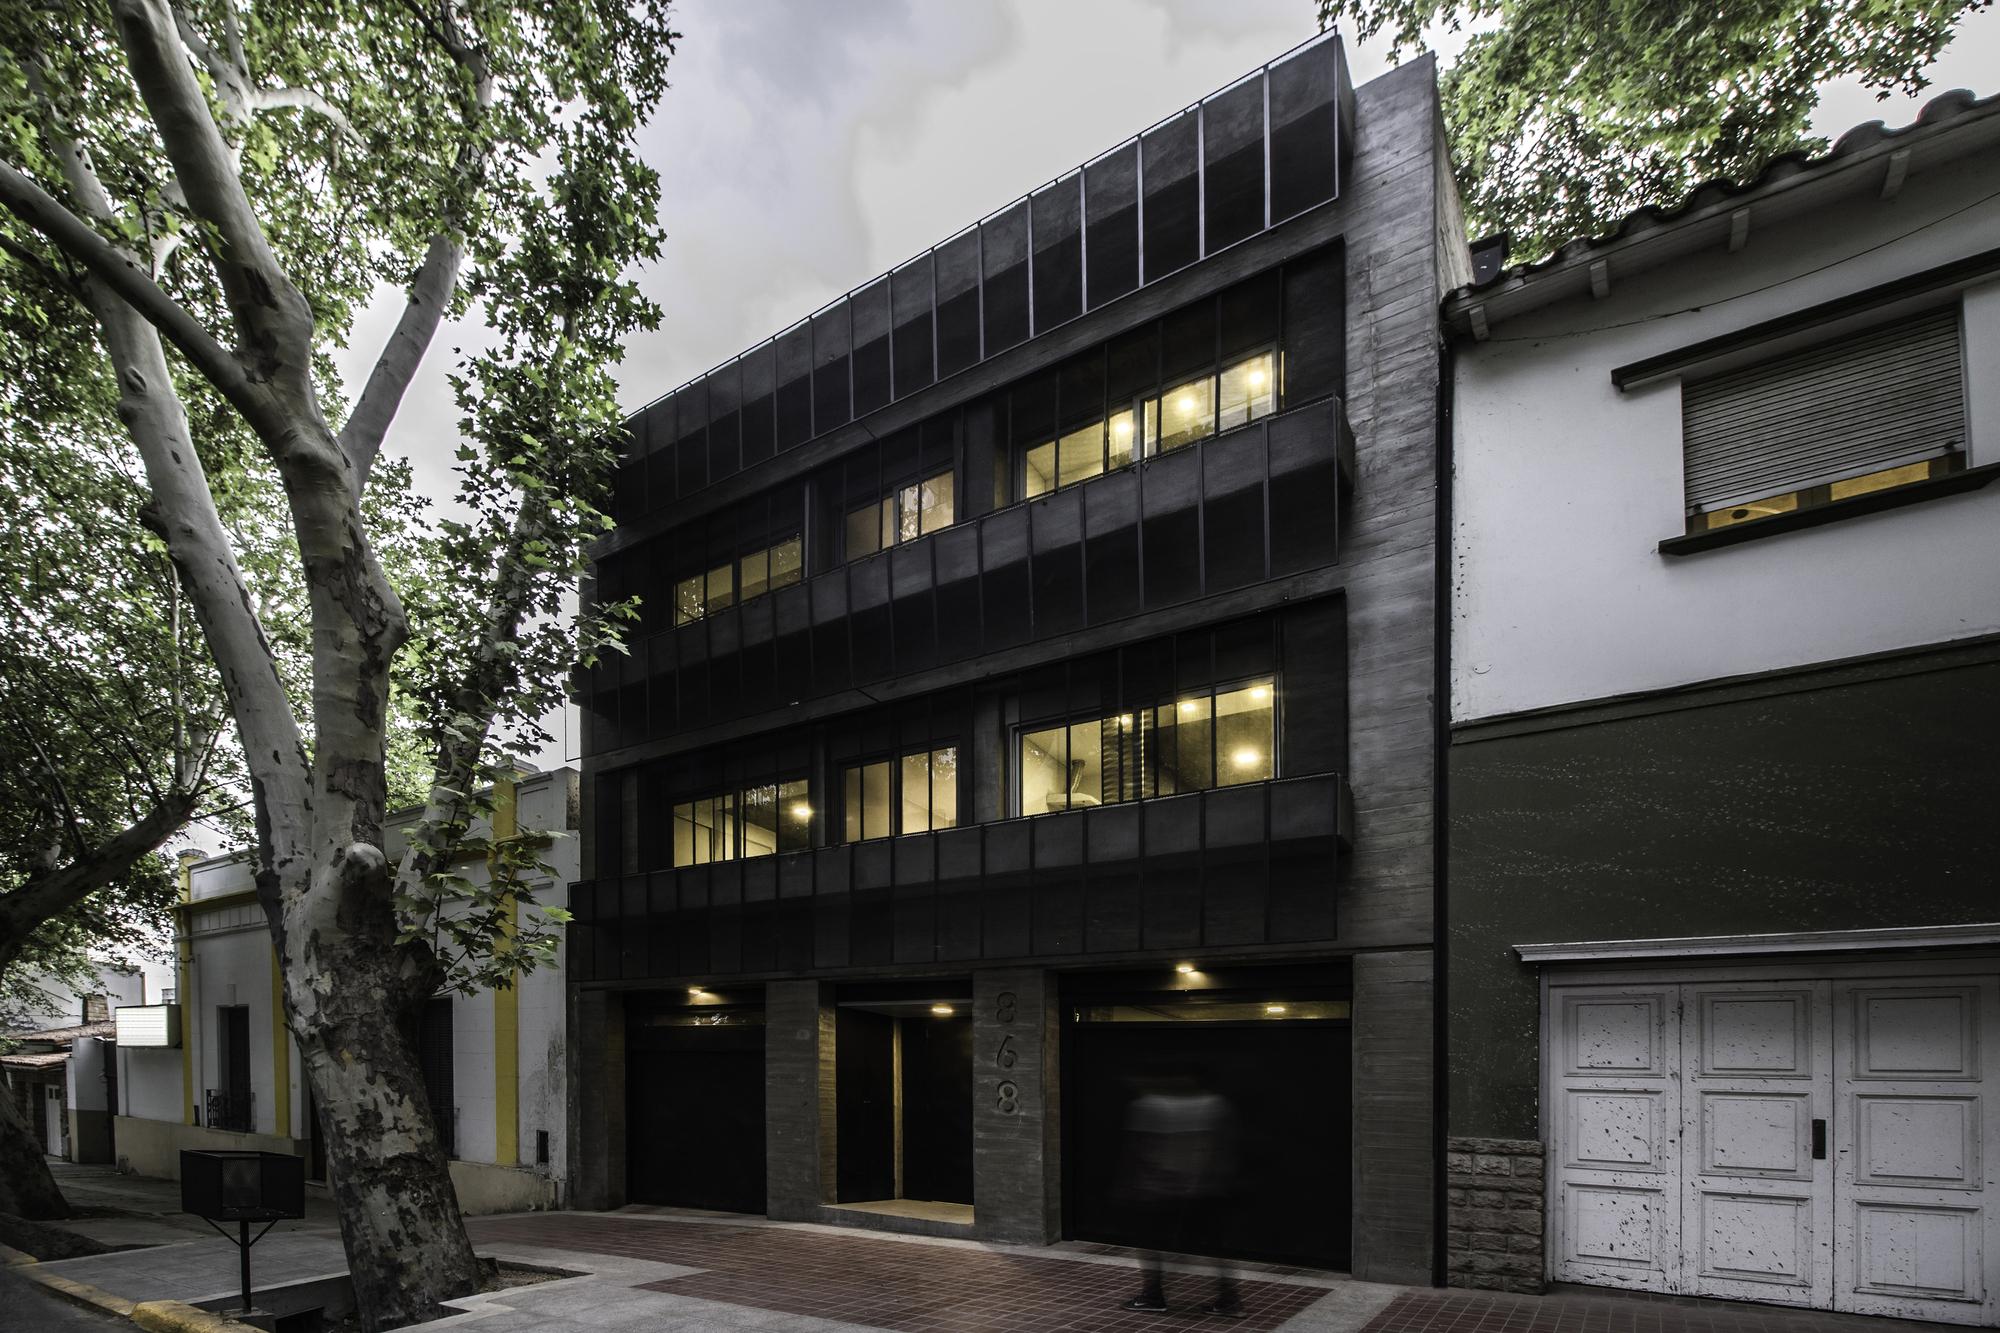 DCA Building / ONA - Oficina Nómada de Arquitectura + Paula Sánchez Arquitectura